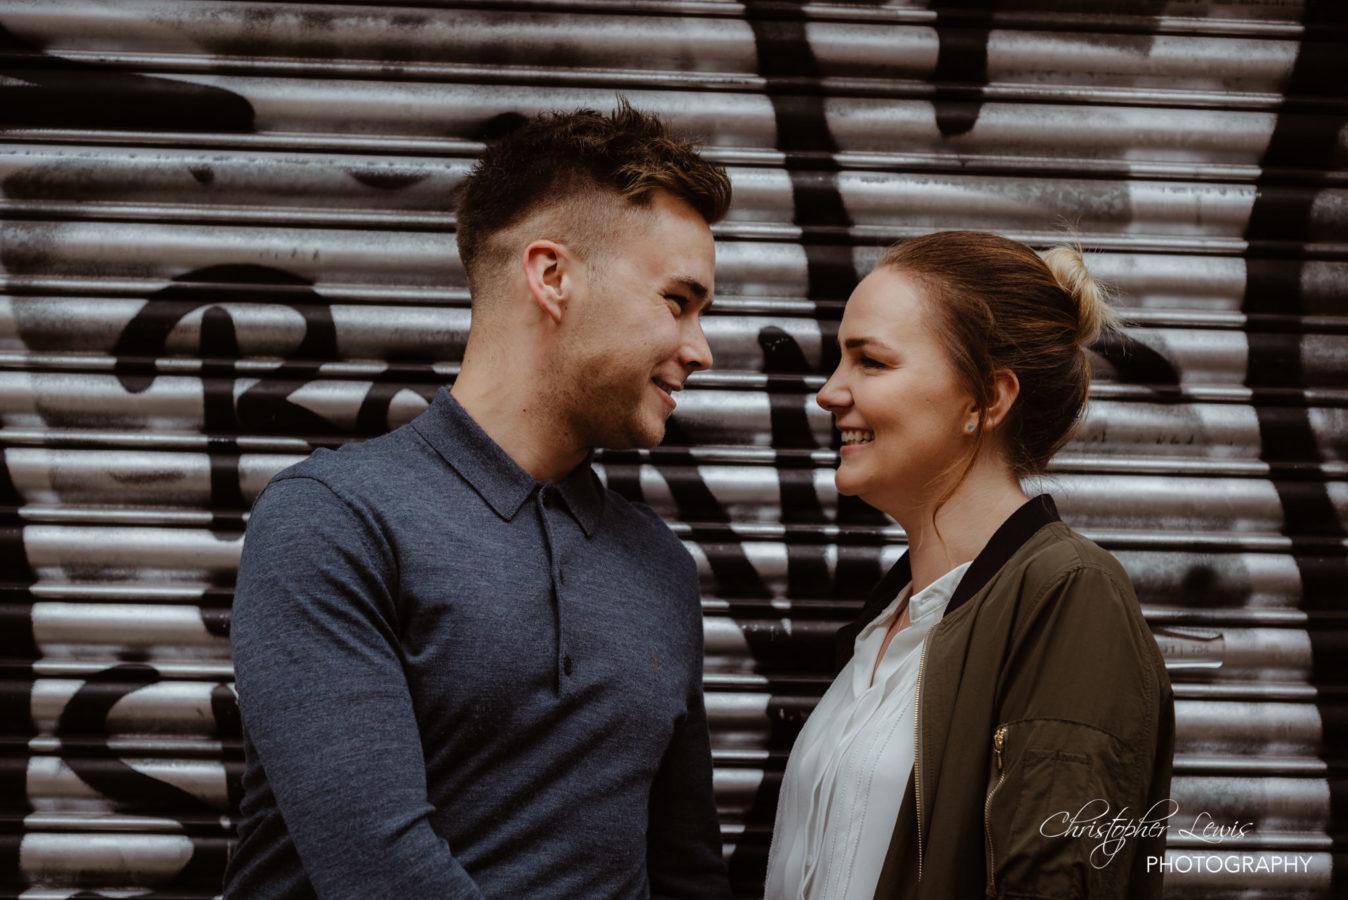 Northern-Quarter-Manchester-Pre-Wedding-Photoshoot-10